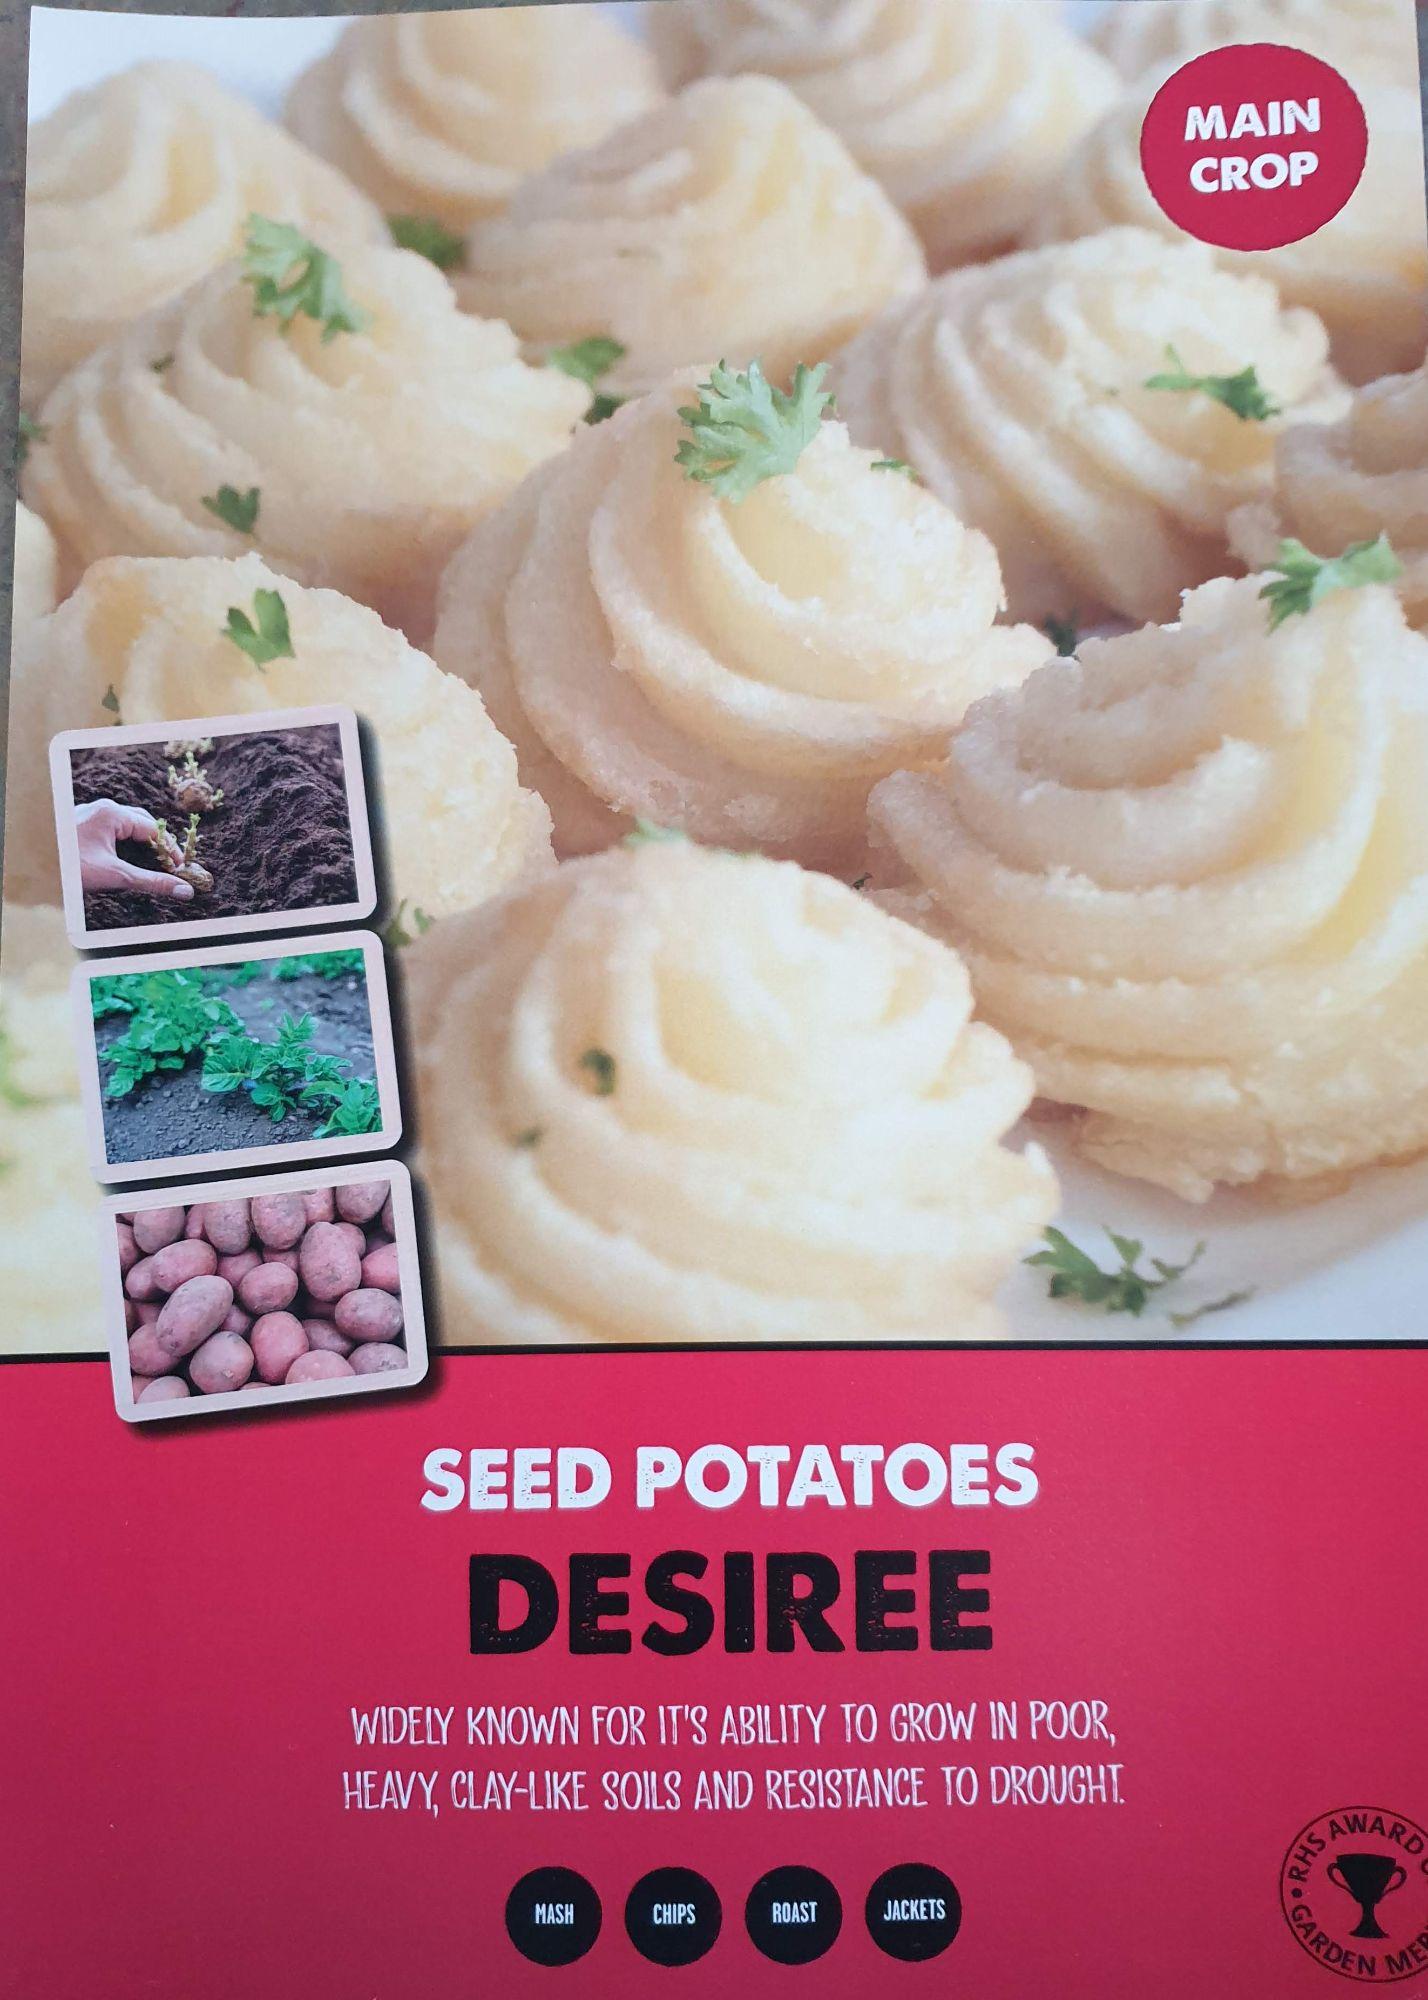 desiree_seed_potato_info.jpg